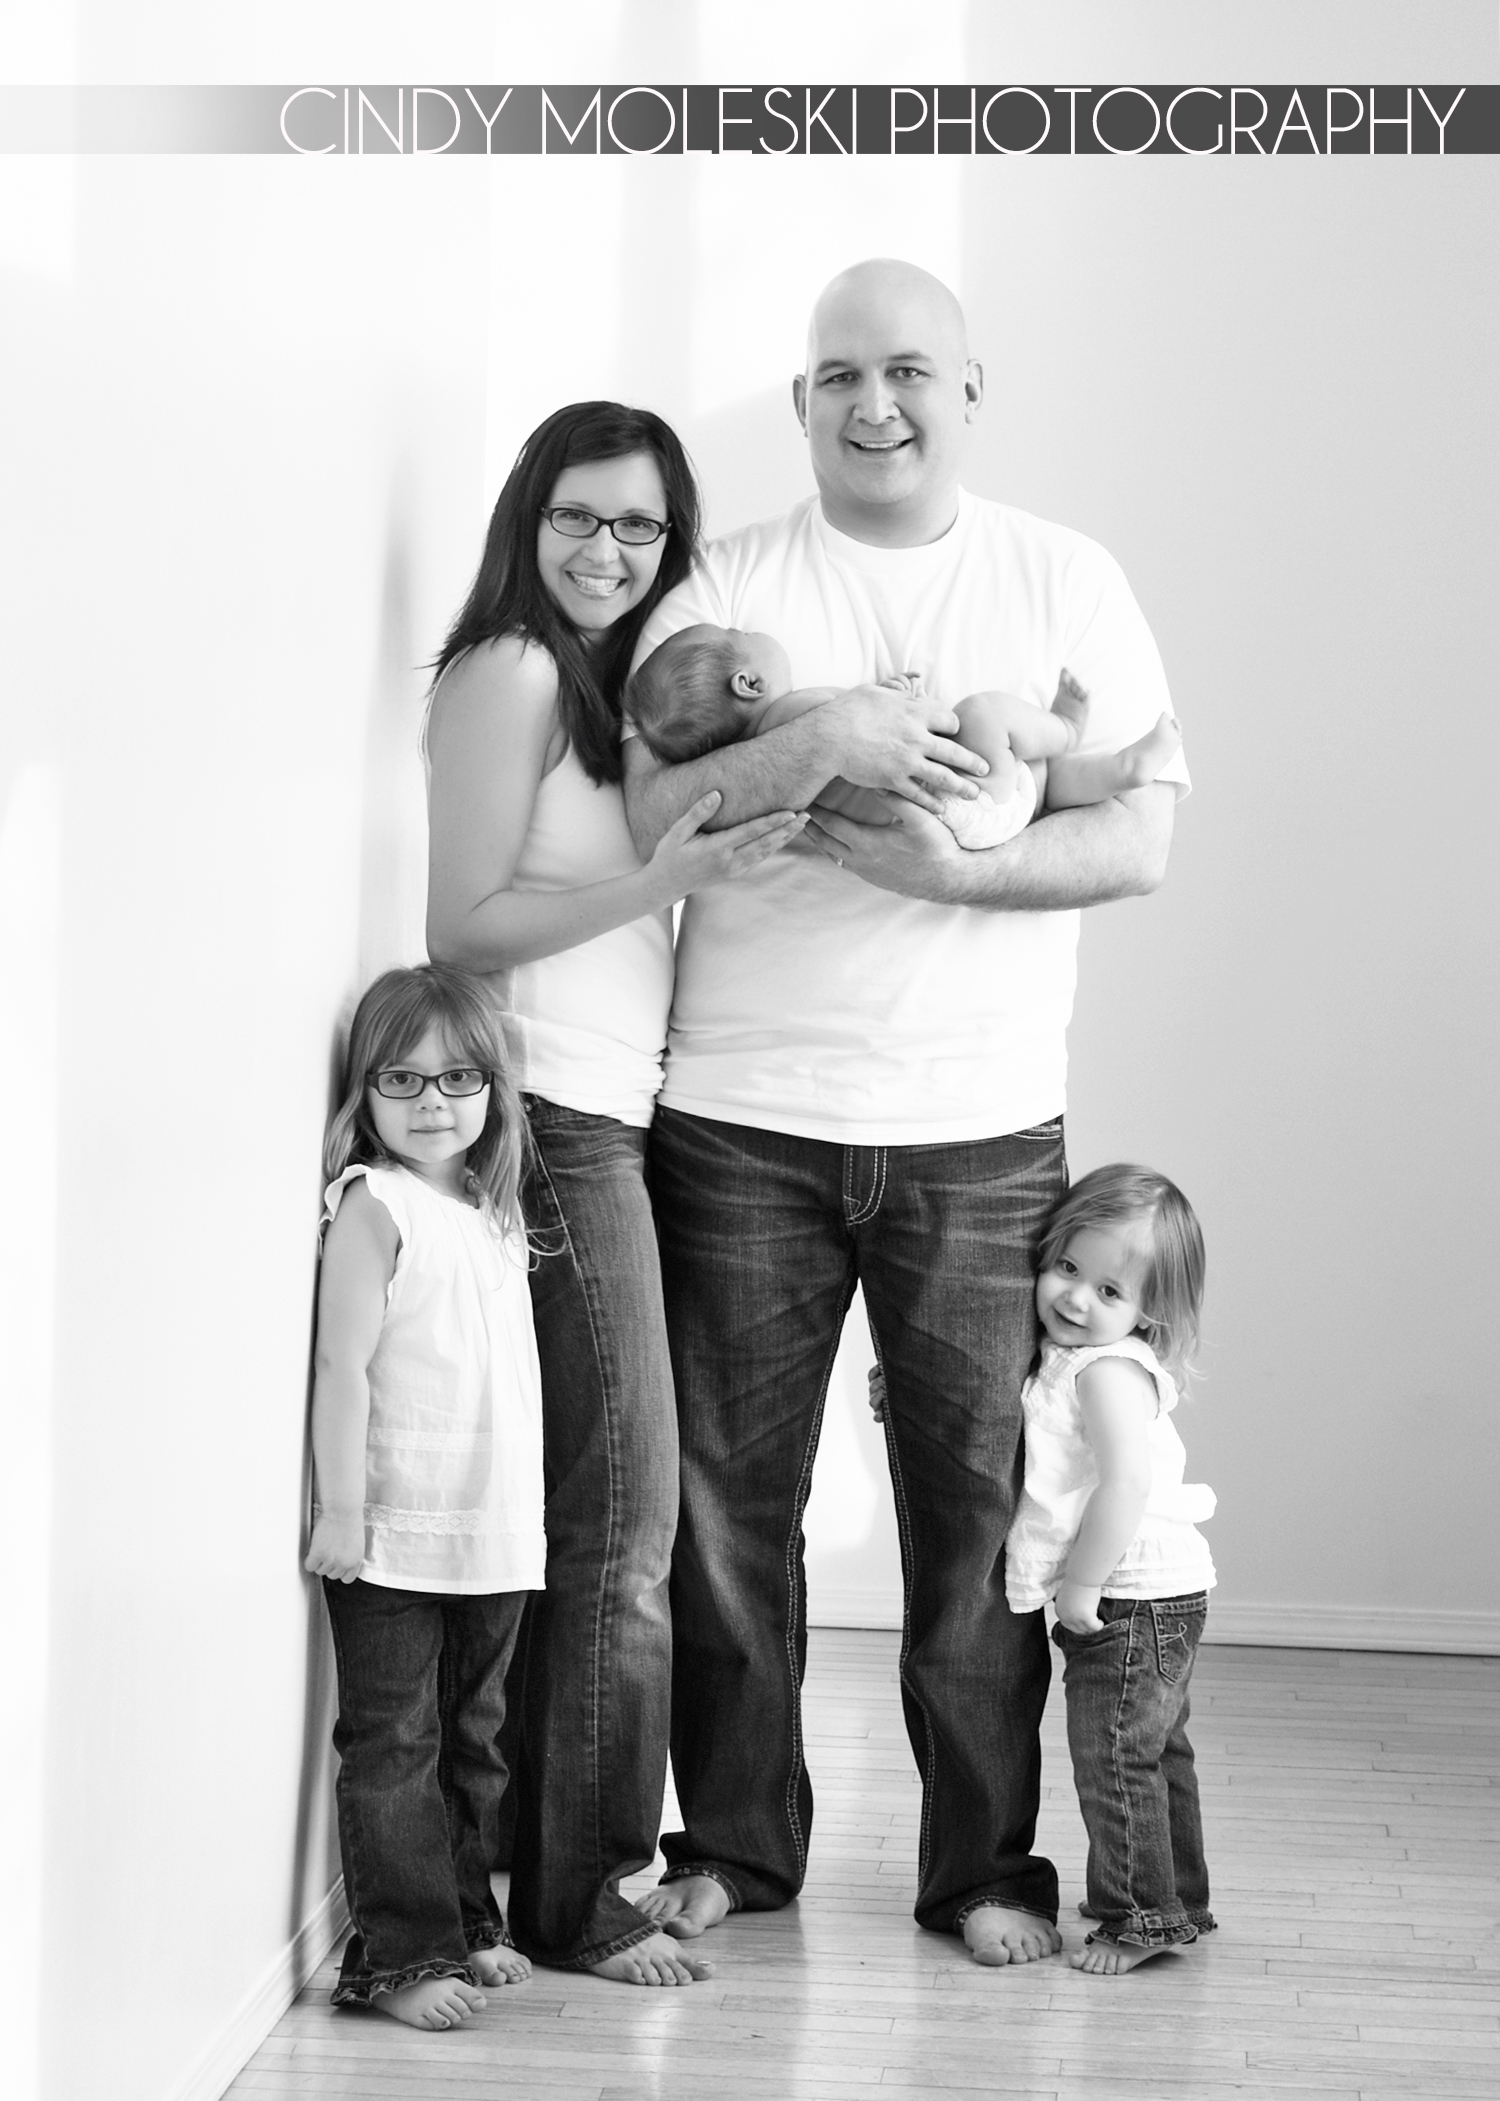 professional-portrait-photographer-saskatoon-cindy-moleski-28463-3556 copy.jpg